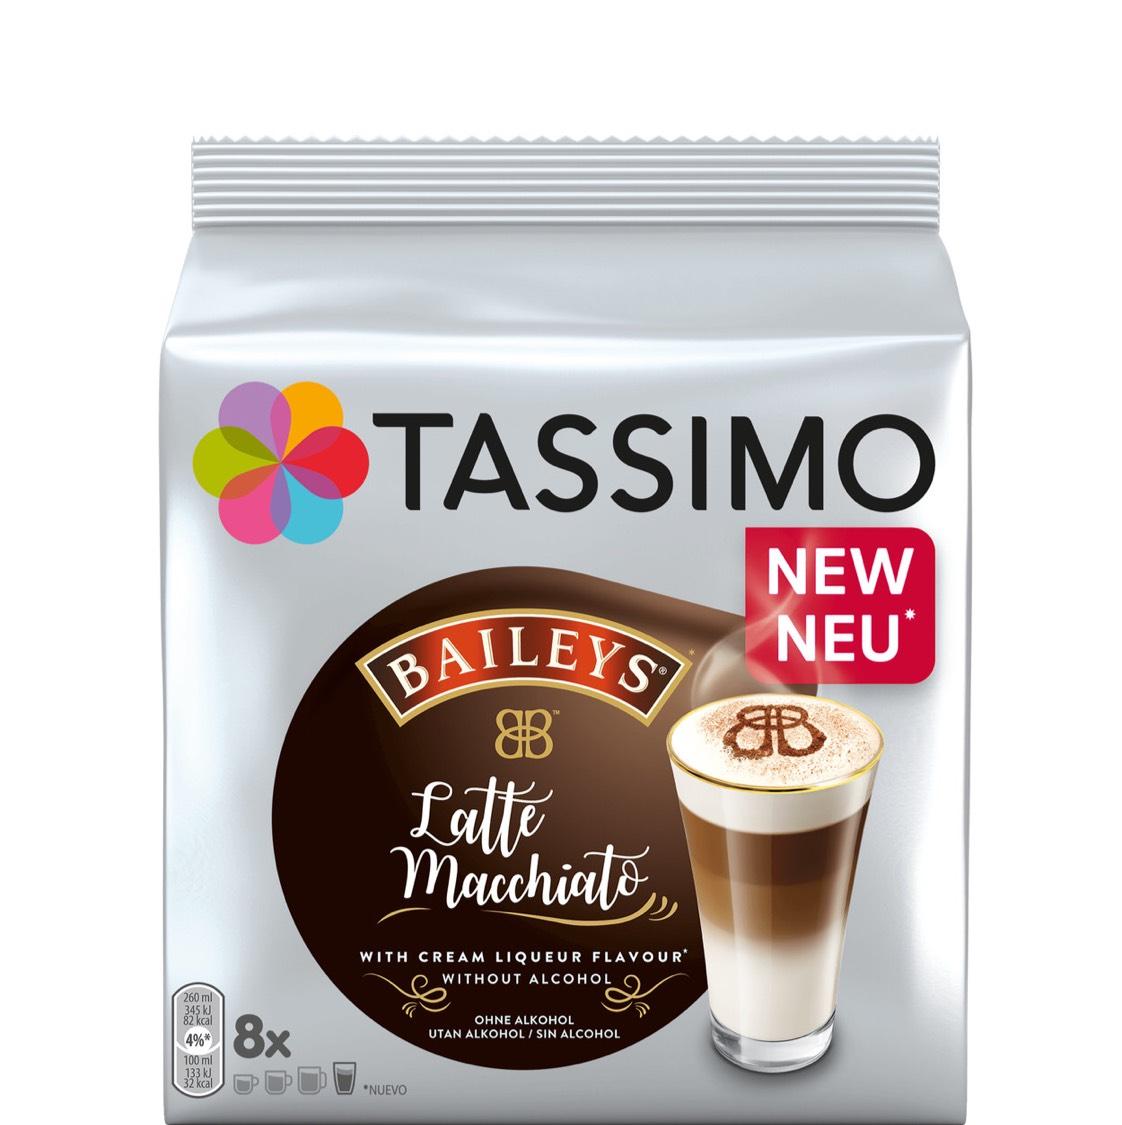 Tassimo Baileys Latte Macchiato £2.50 instore @ Tesco